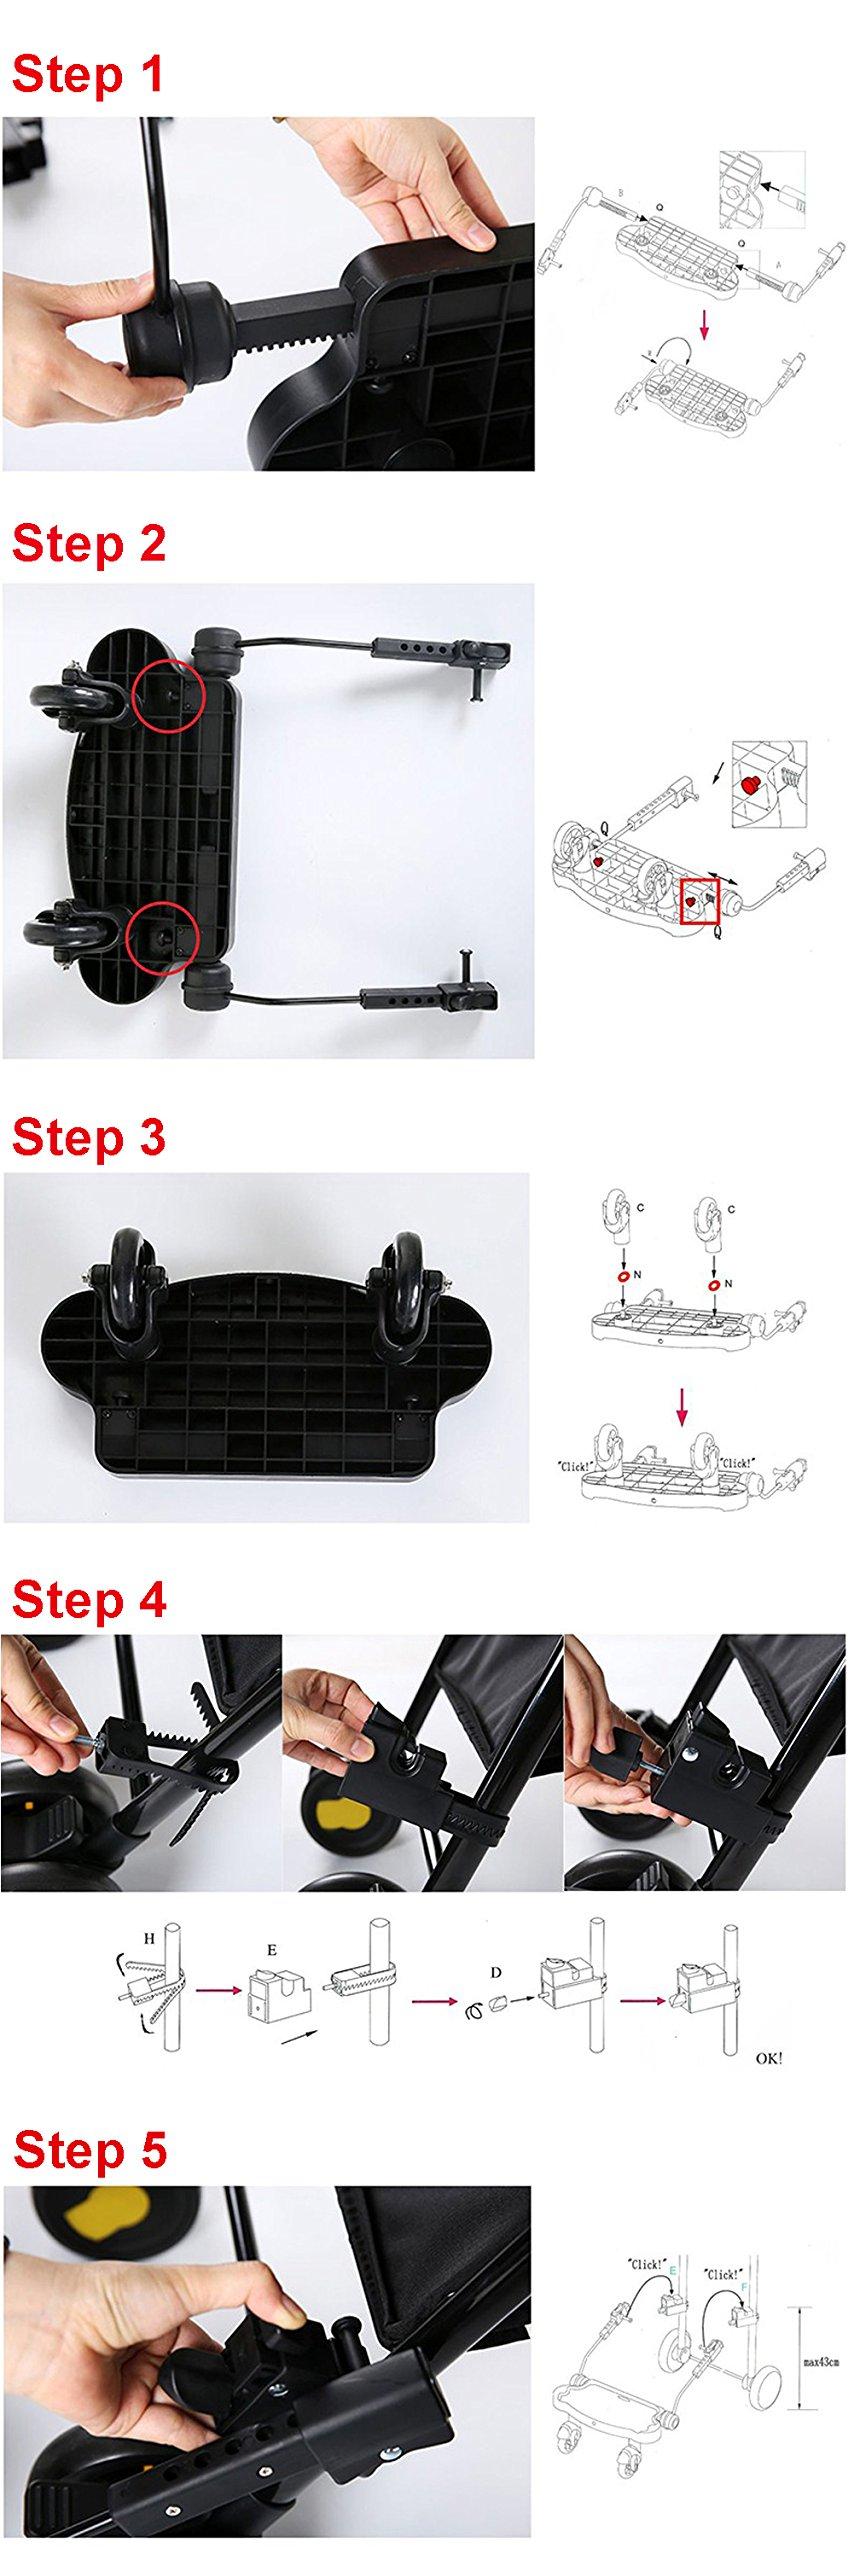 Zerlar Universal Ride-On Stroller Board Stroller Connectors by Zerlar (Image #6)